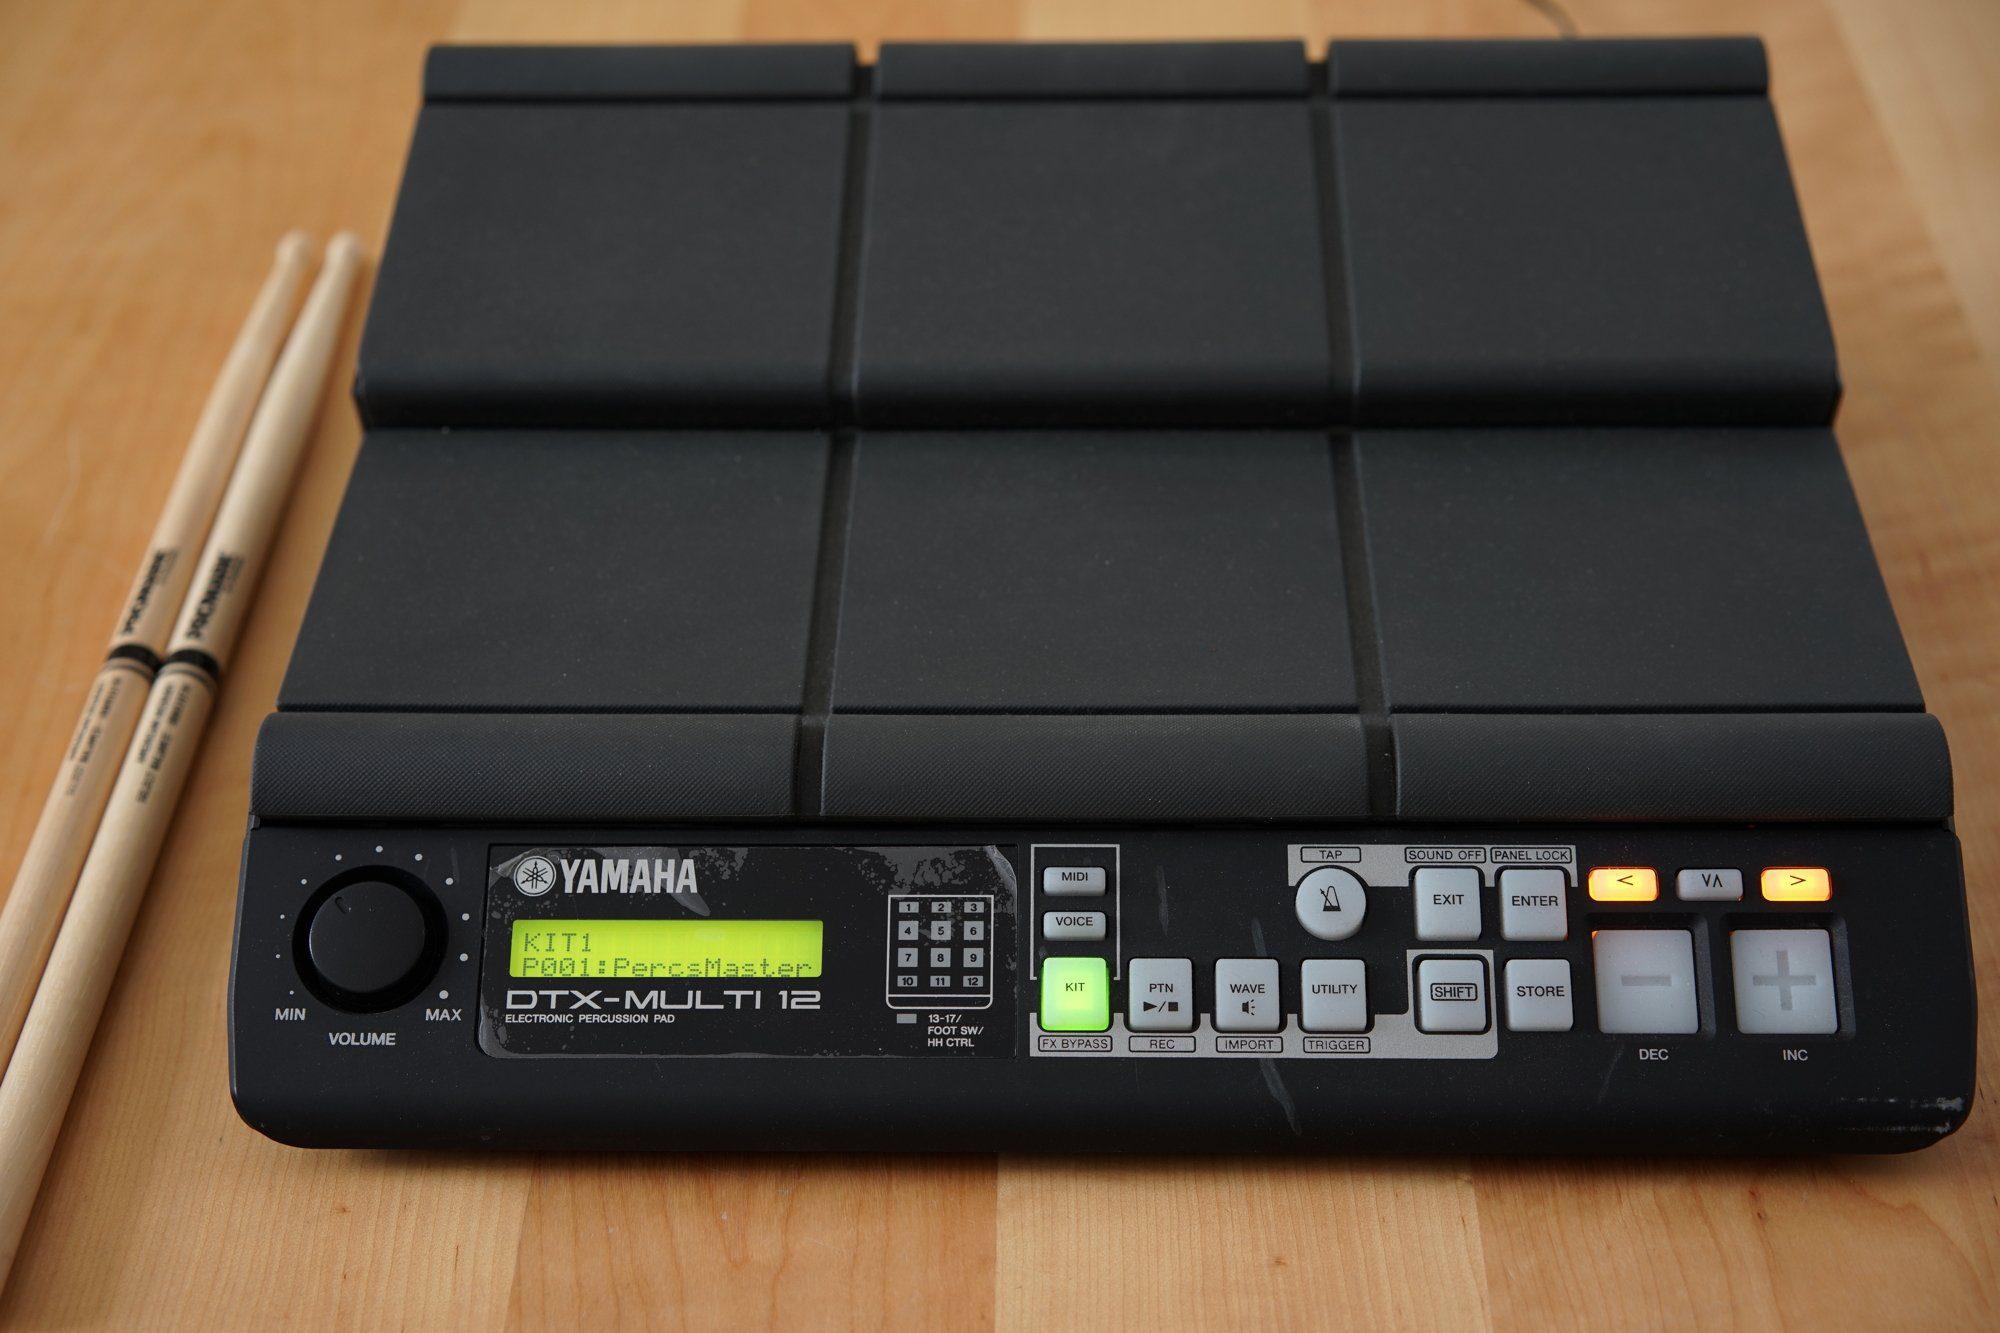 Yamaha dtx multi 12 Specs vs roland spd 30 Manual